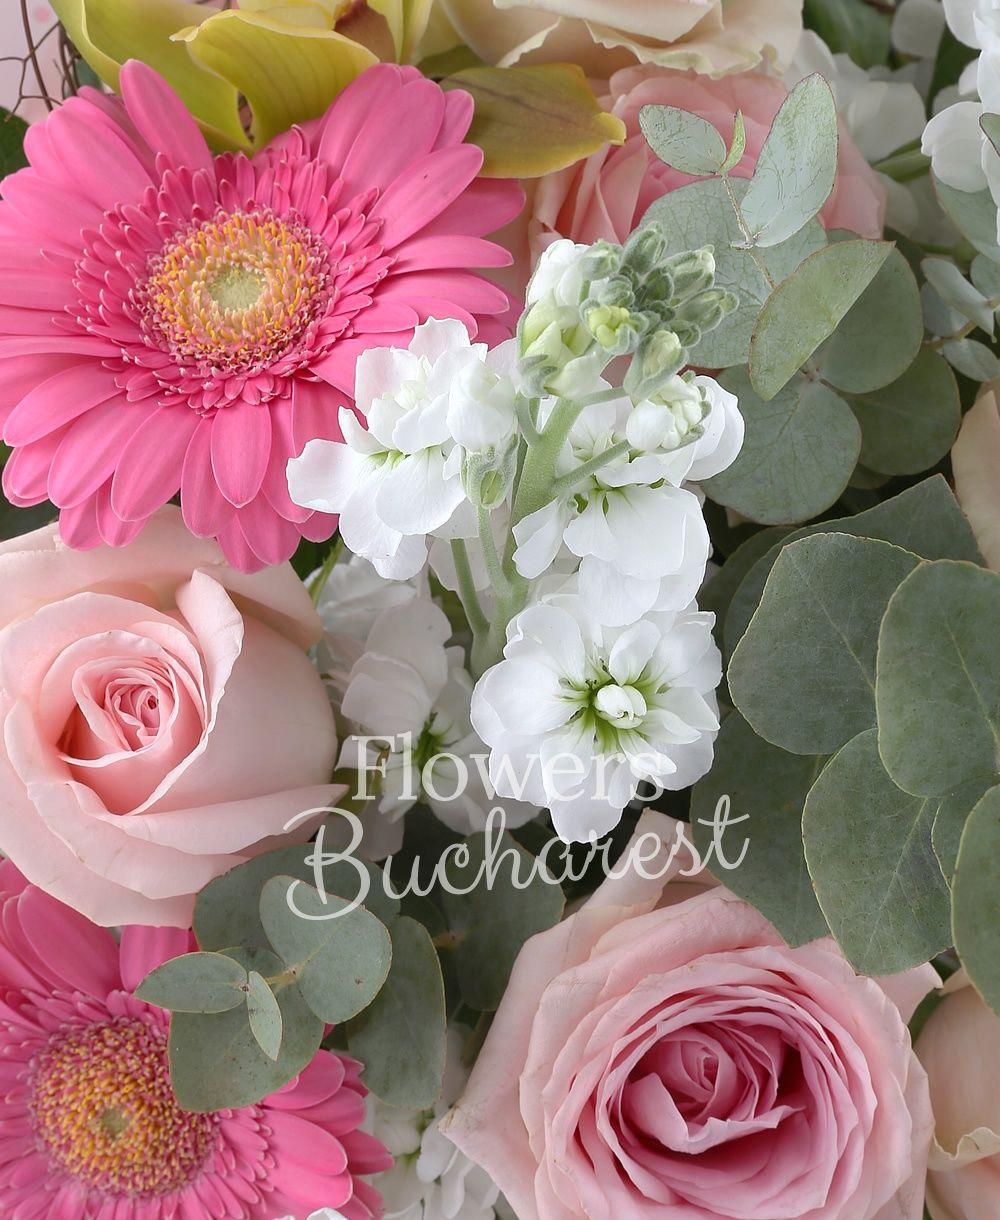 7 pink roses, 10 white matthiola, 5 pink gerbera, green cymbidium, greenery